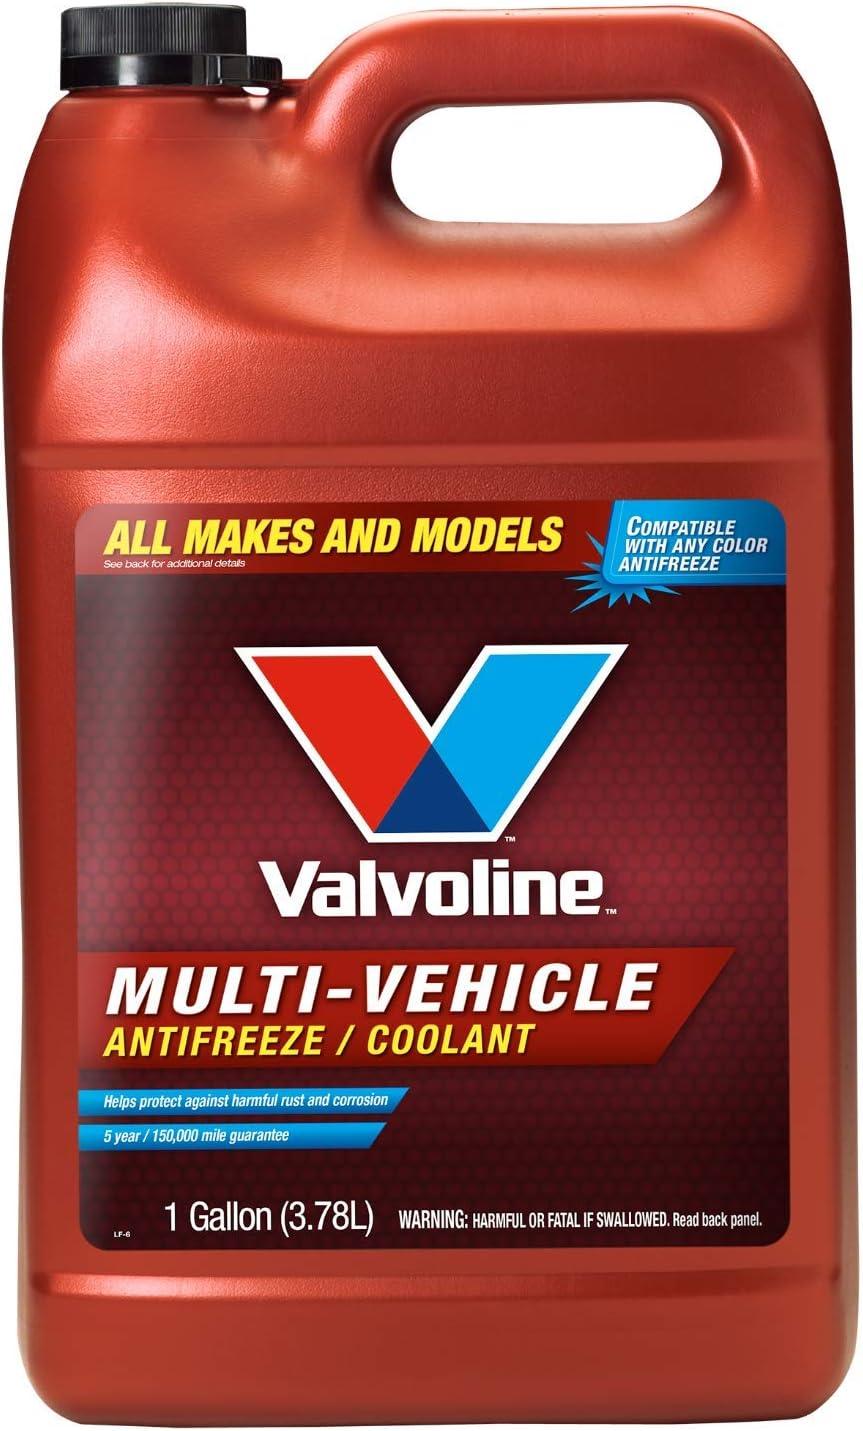 MaxLife Valvoline通用防冻/冷却剂